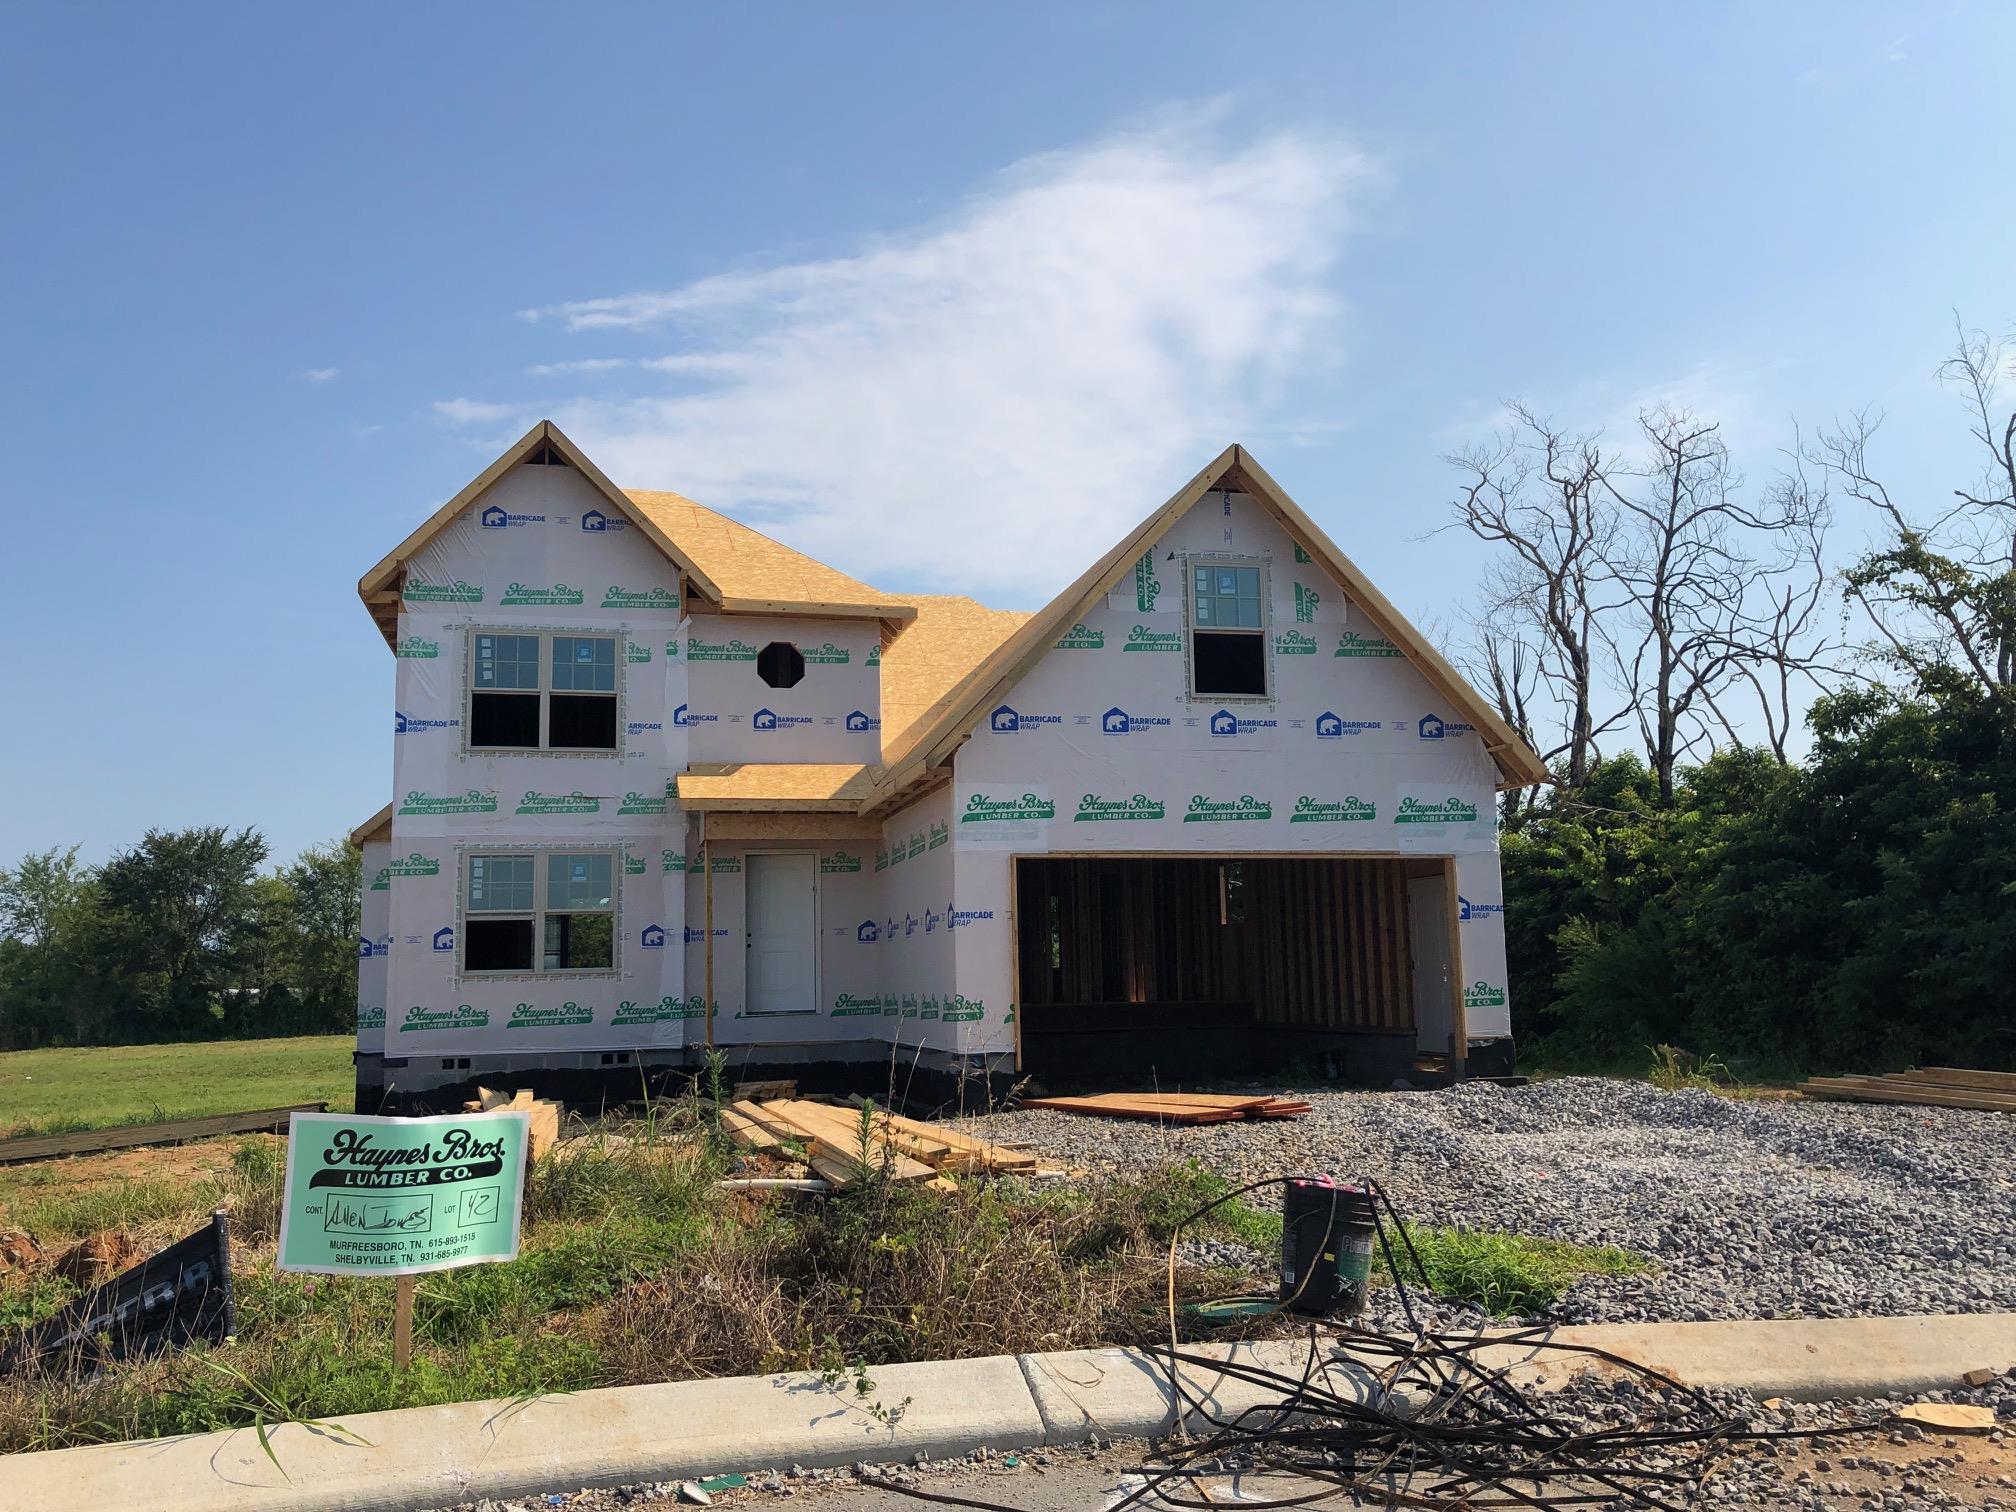 8009 Alameda Dr, Murfreesboro, TN 37127 - Murfreesboro, TN real estate listing